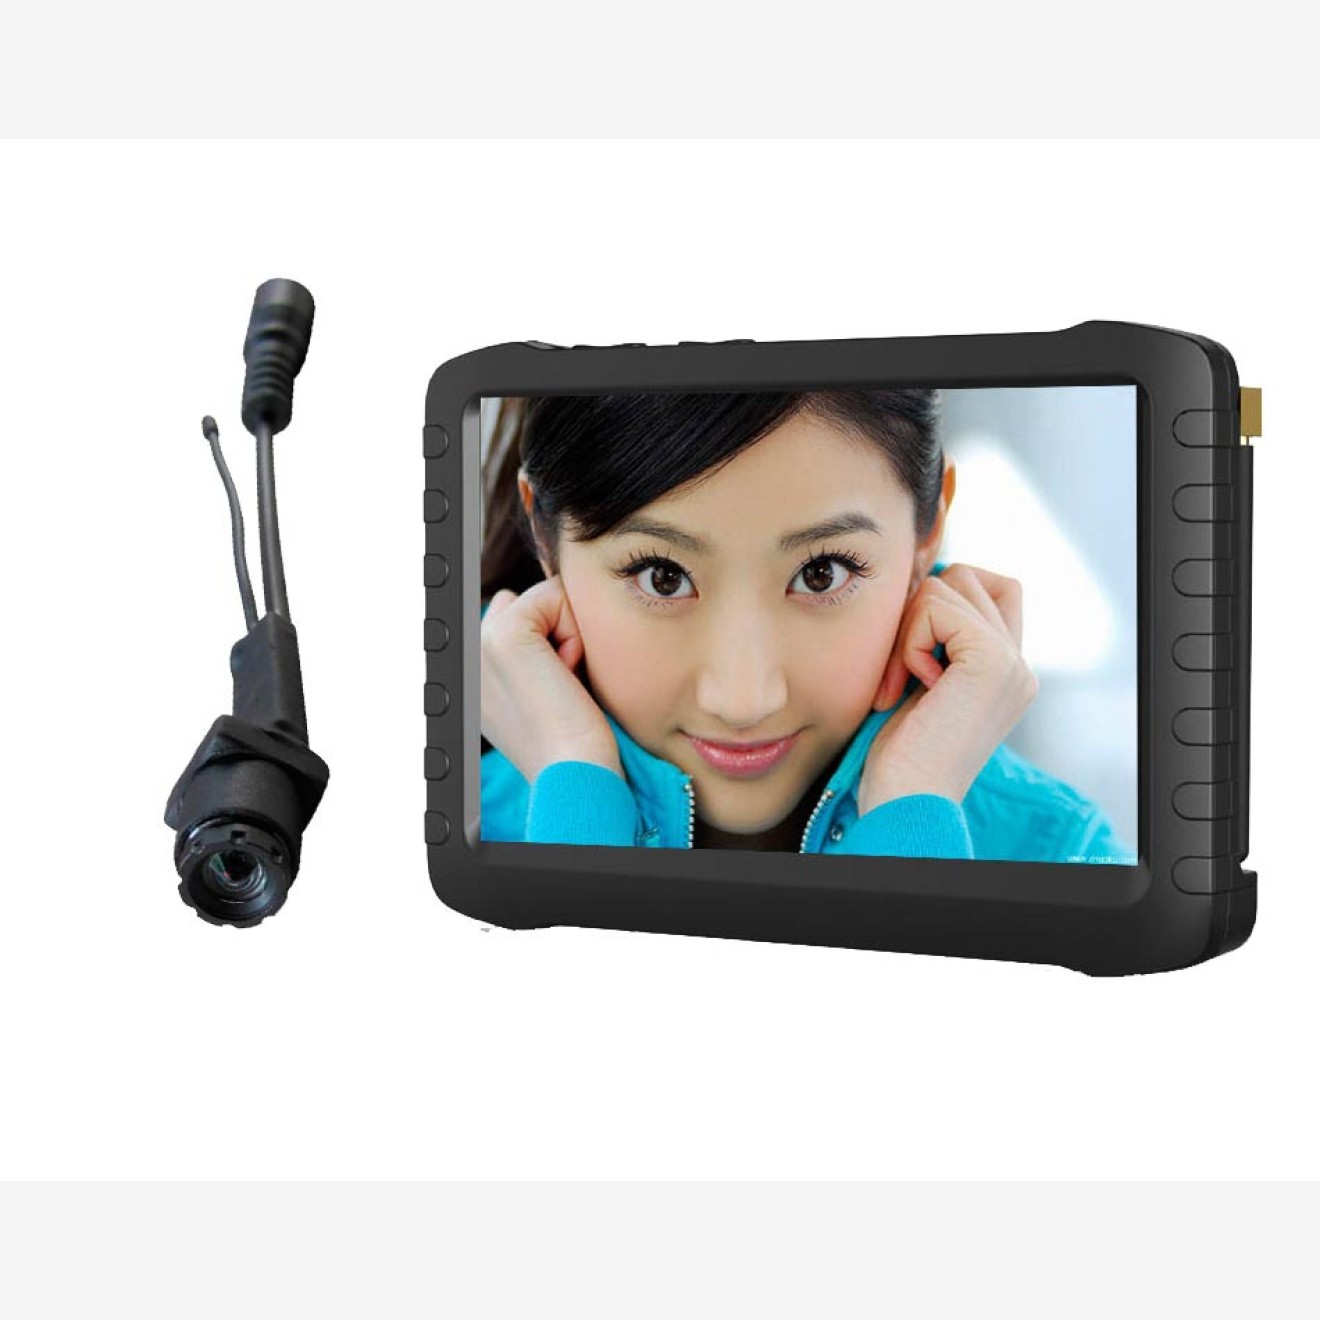 fpv komplettset portabler 5 zoll berry monitor mit 5 8 ghz funk kamera eagle 1. Black Bedroom Furniture Sets. Home Design Ideas